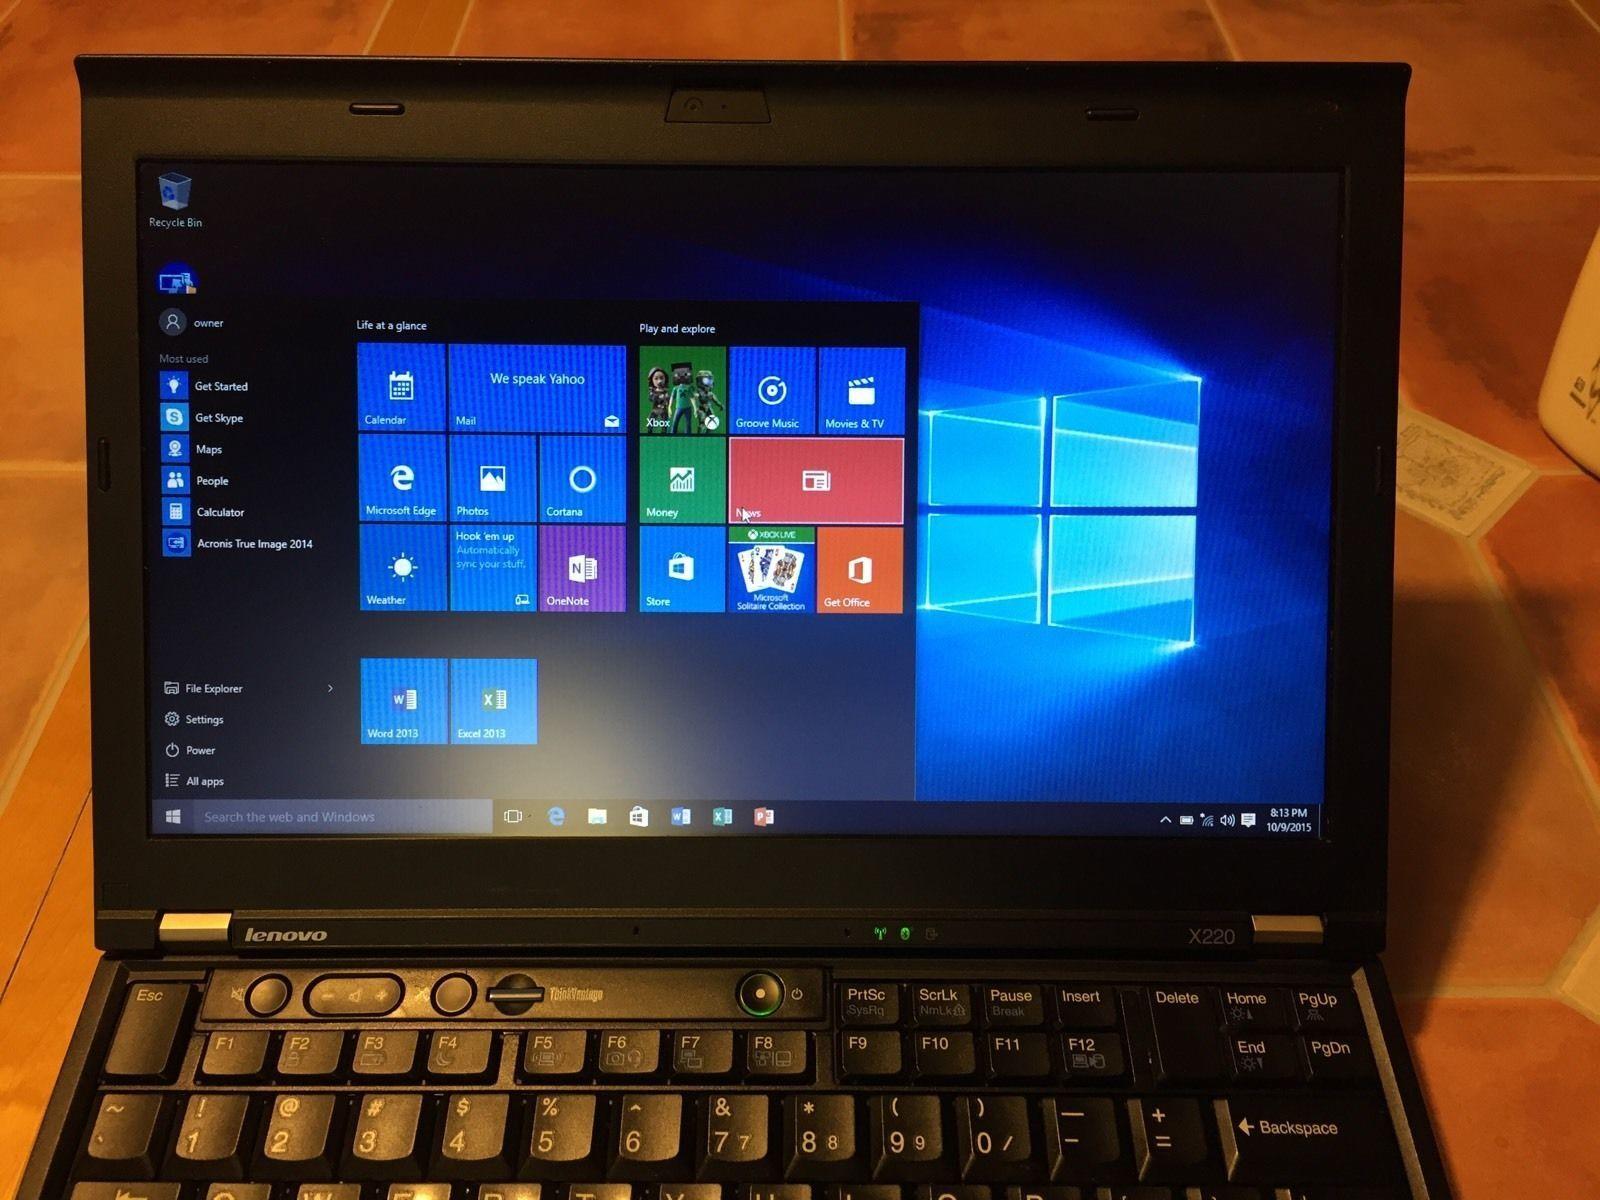 $185.00 - Lenovo ThinkPad Laptop X220 i5 2.5GHz 6GB 120GB SSD Windows 10 Charger